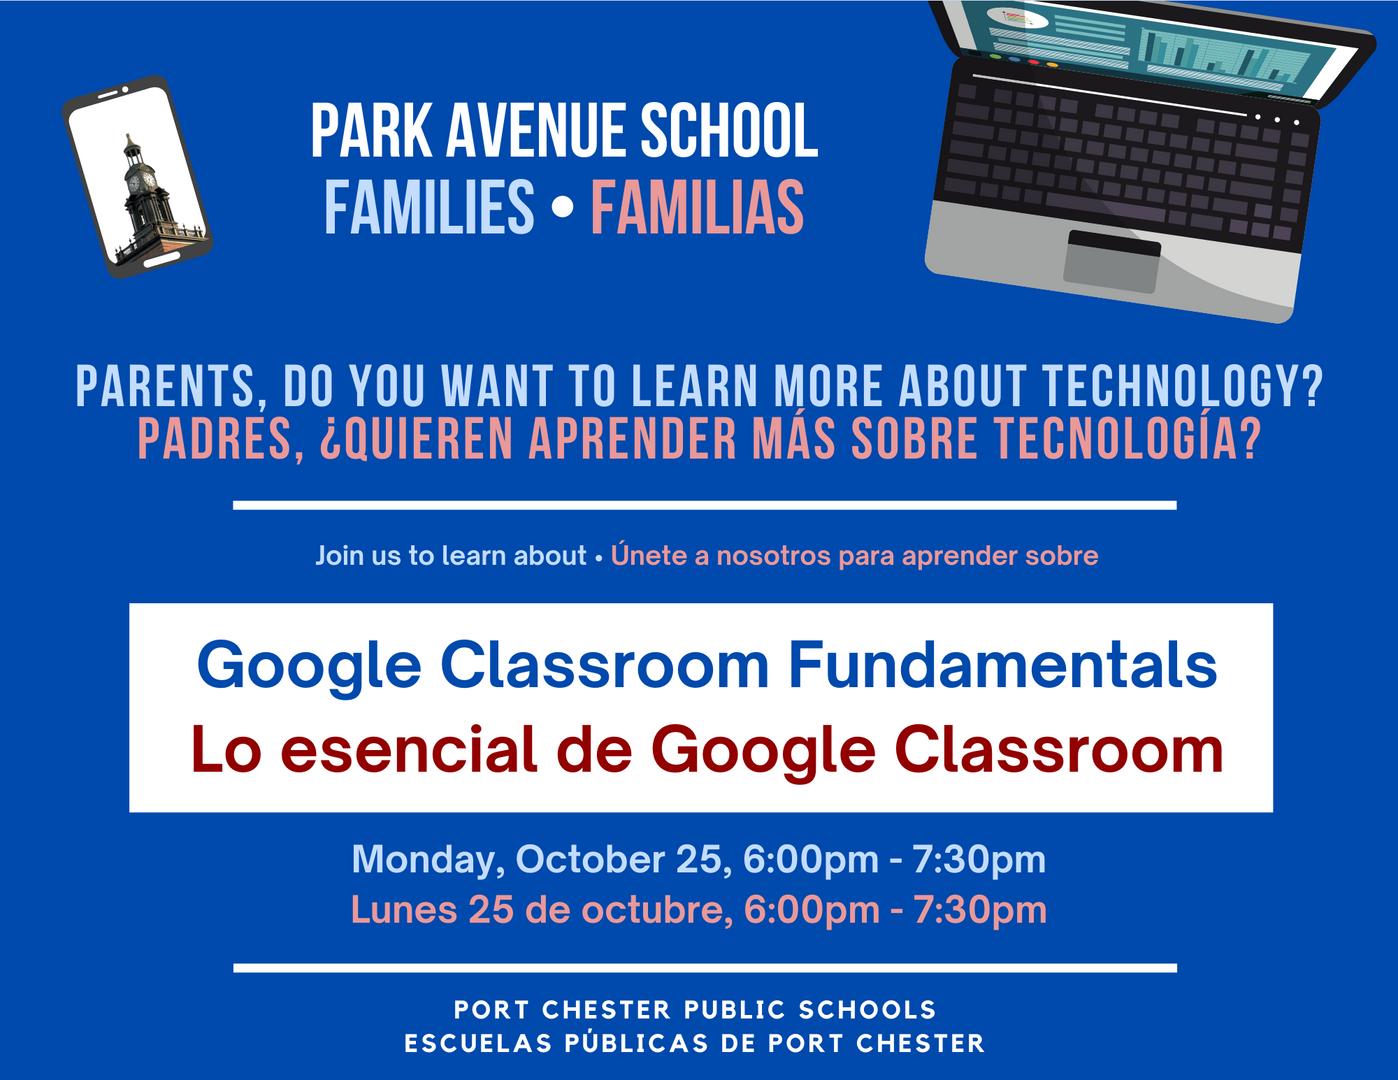 Flyer for family technology workshop